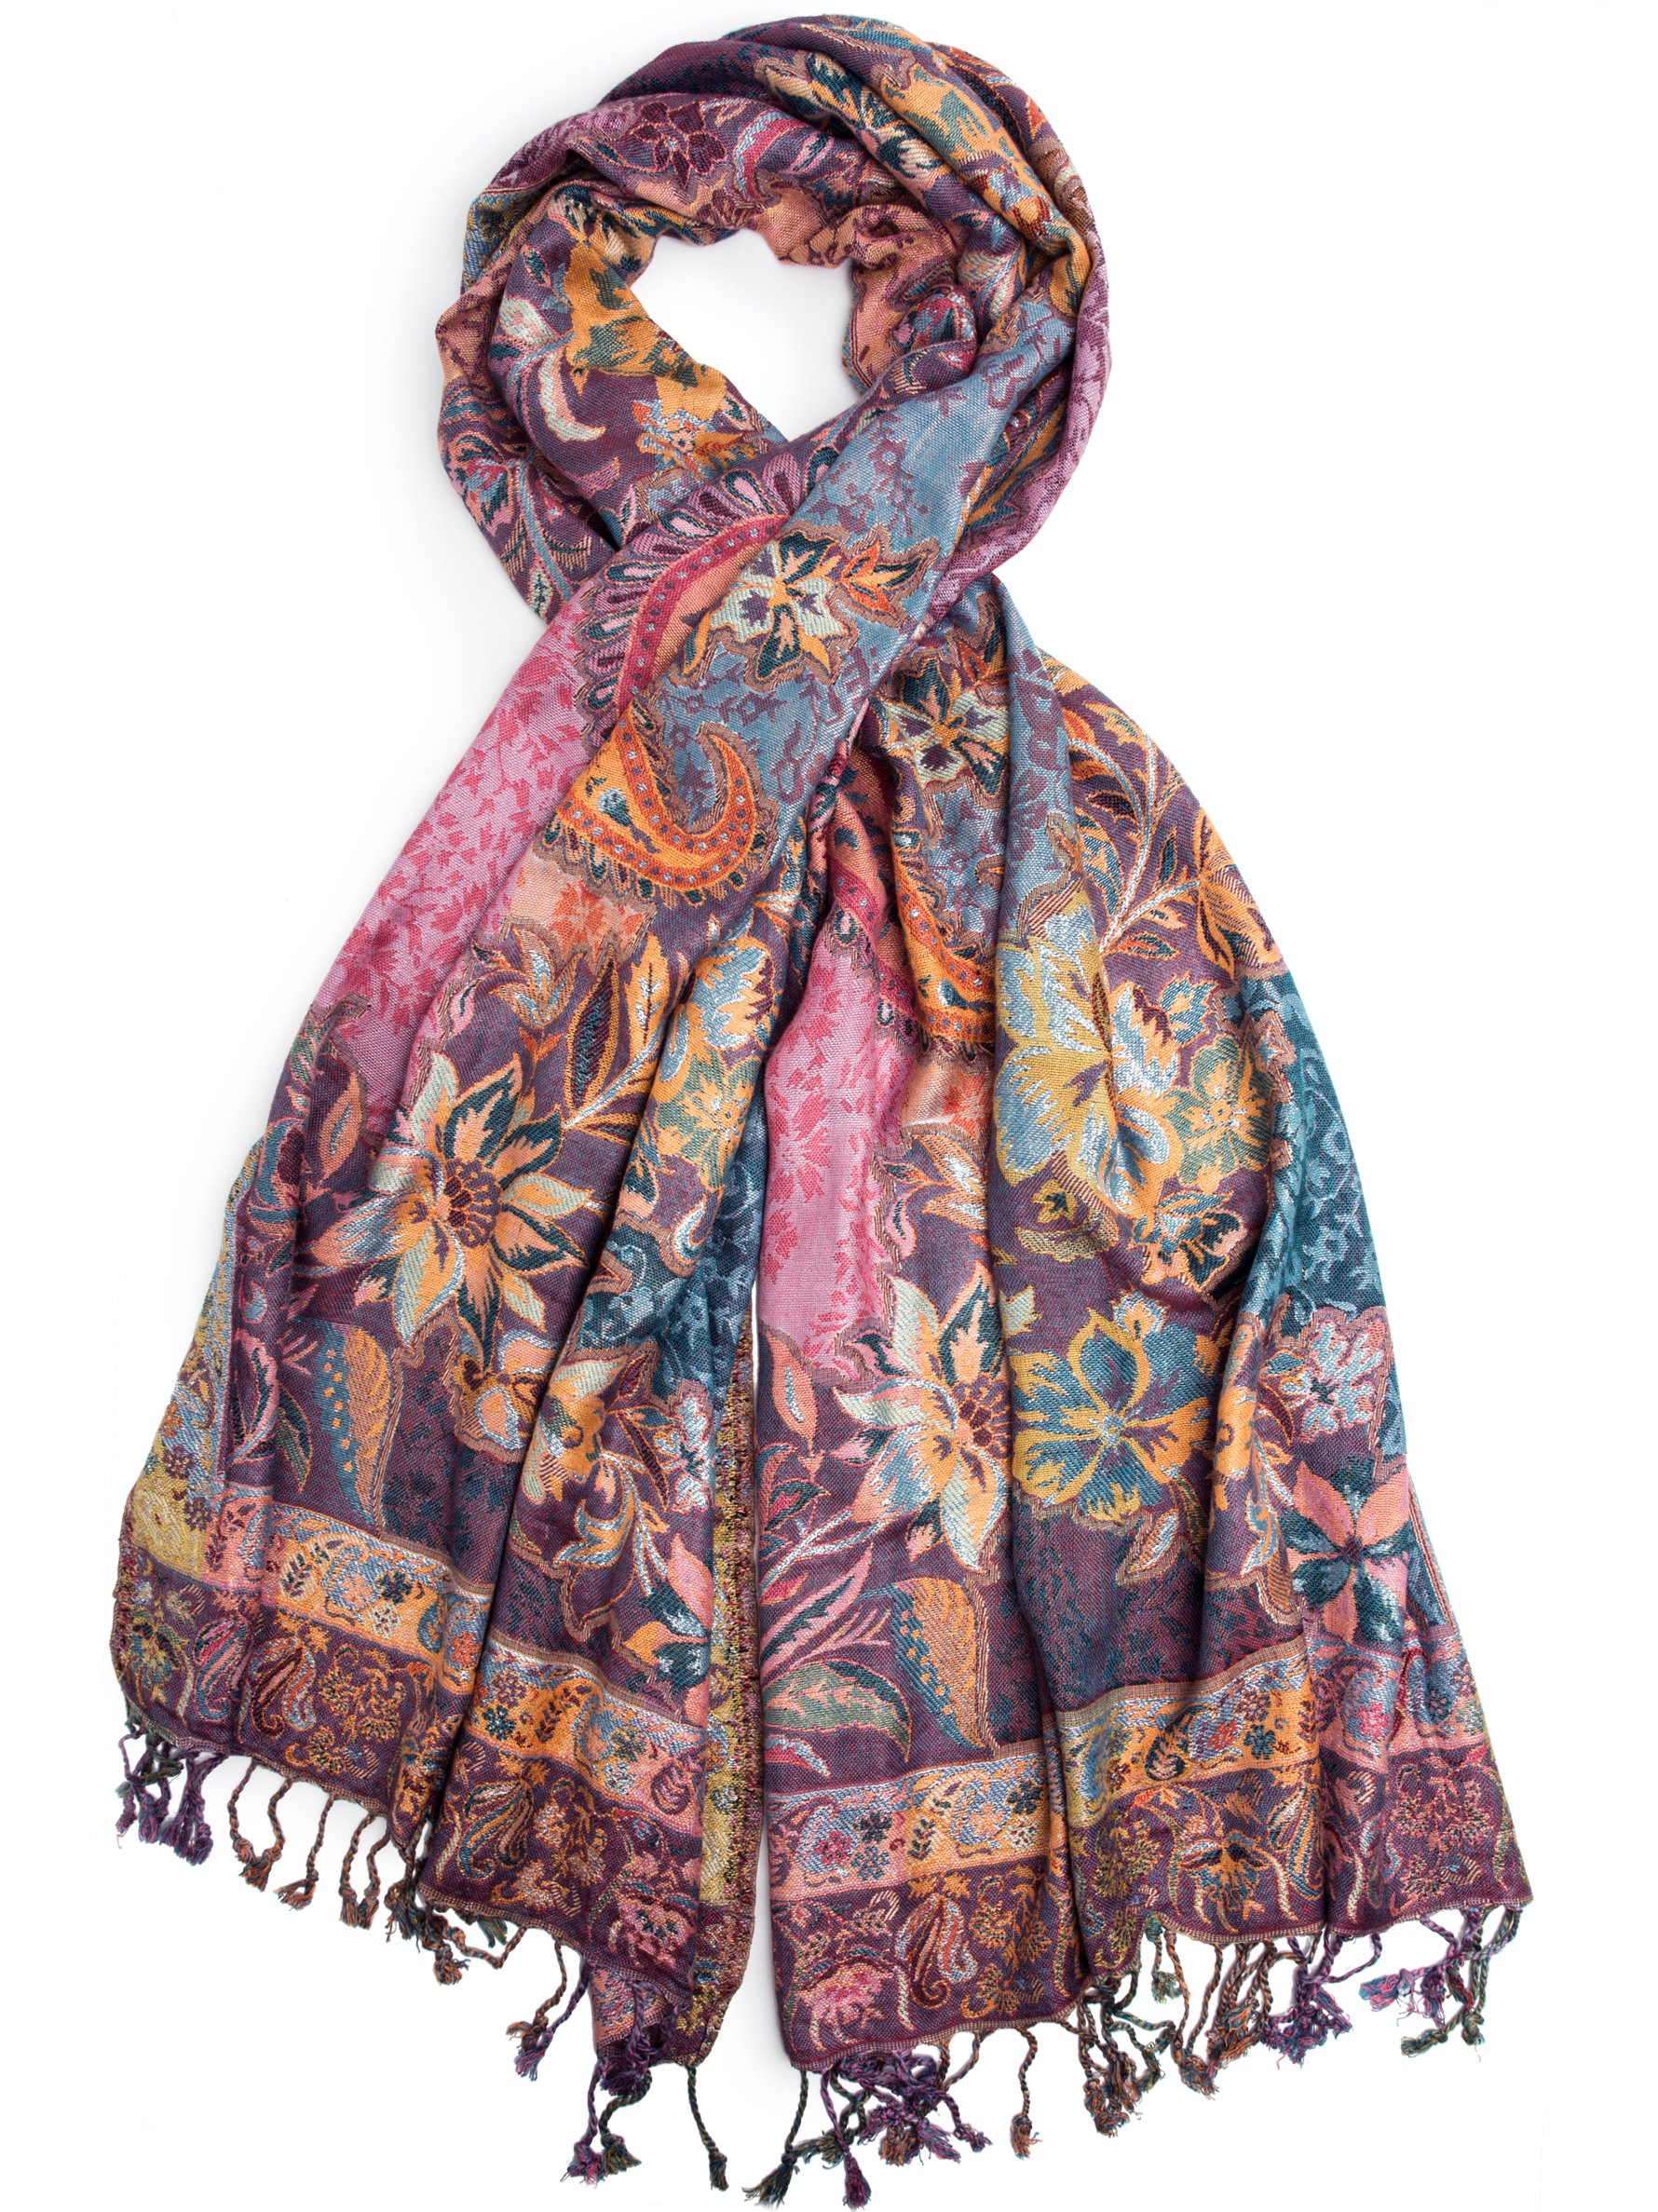 Bohomonde, Bethshaya Reversible Cashmere Silk Pashmina Scarf, hand made in India (Purple/Magenta/Orange)